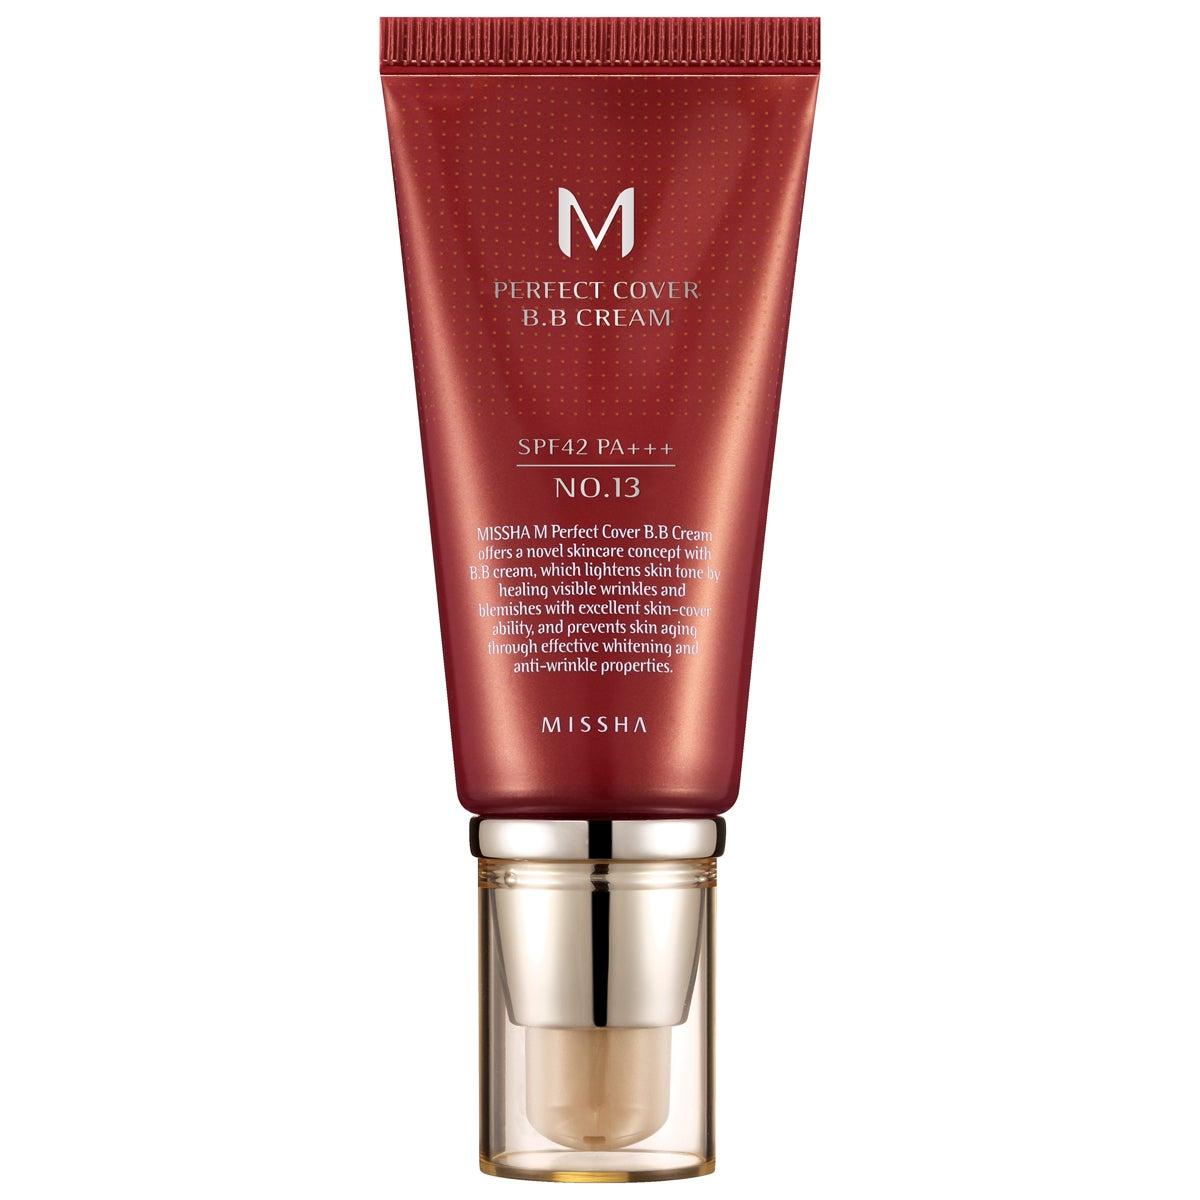 M Perfect Cover BB Cream SPF42/PA+++ 50 ml MISSHA K-Beauty